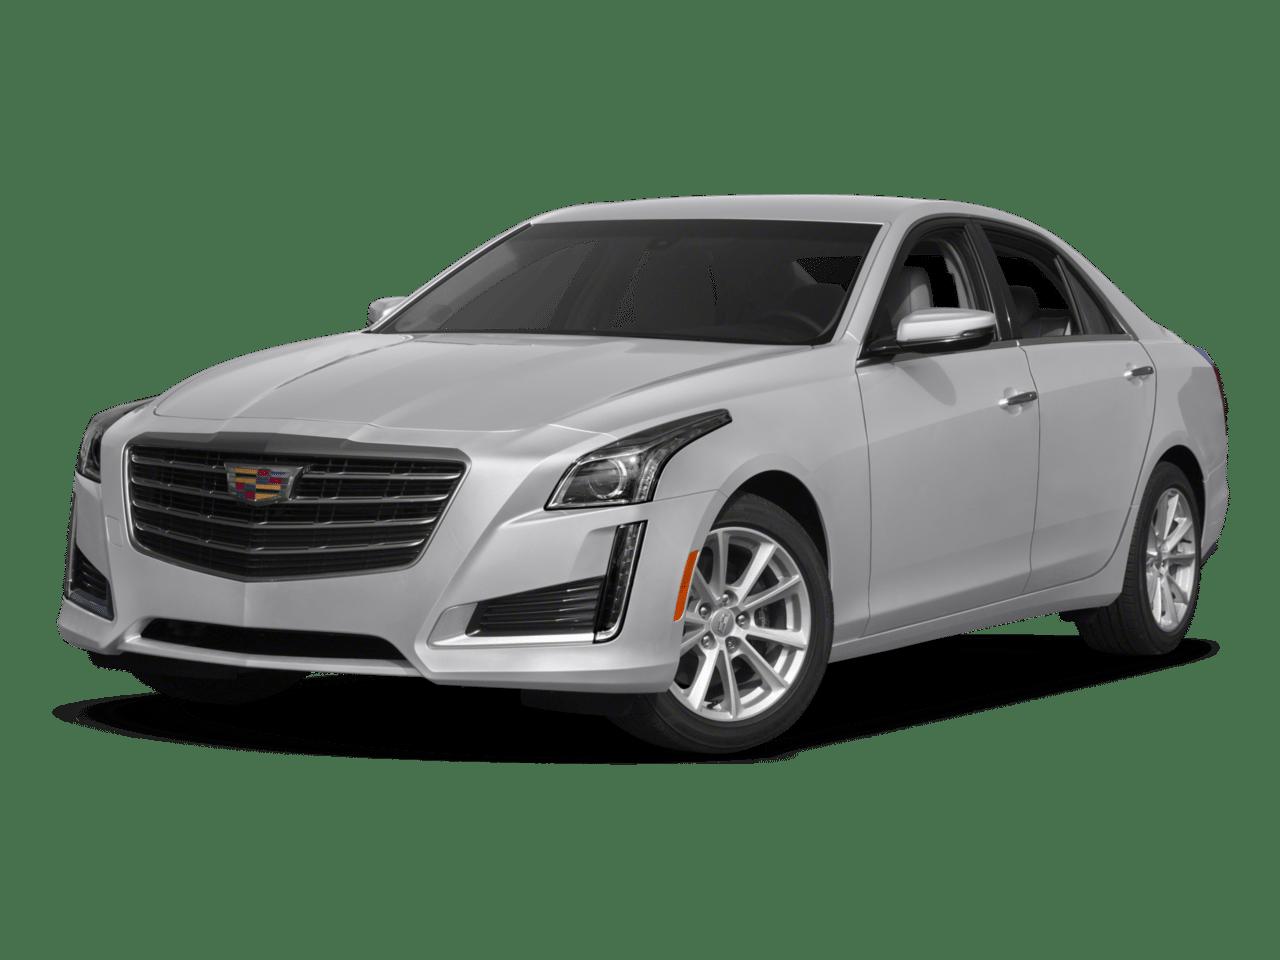 Cadillac CTS transmission fluid capacity